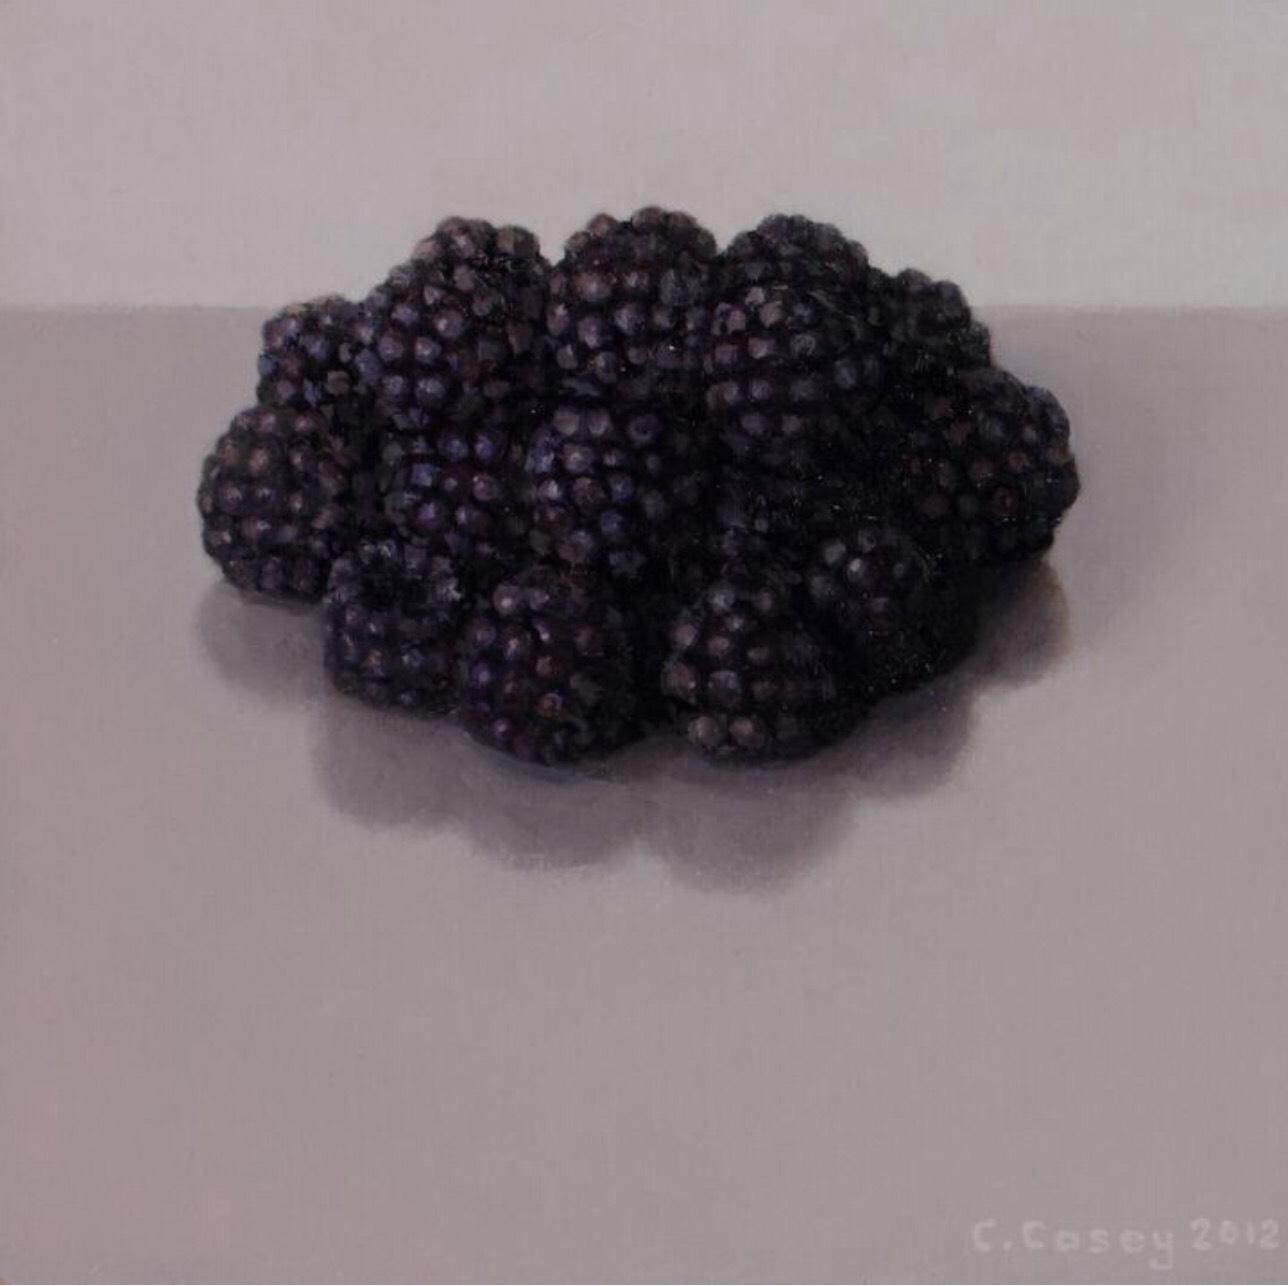 Comhghall Casey, Blackberries, oil on board, 10 x 10 cm